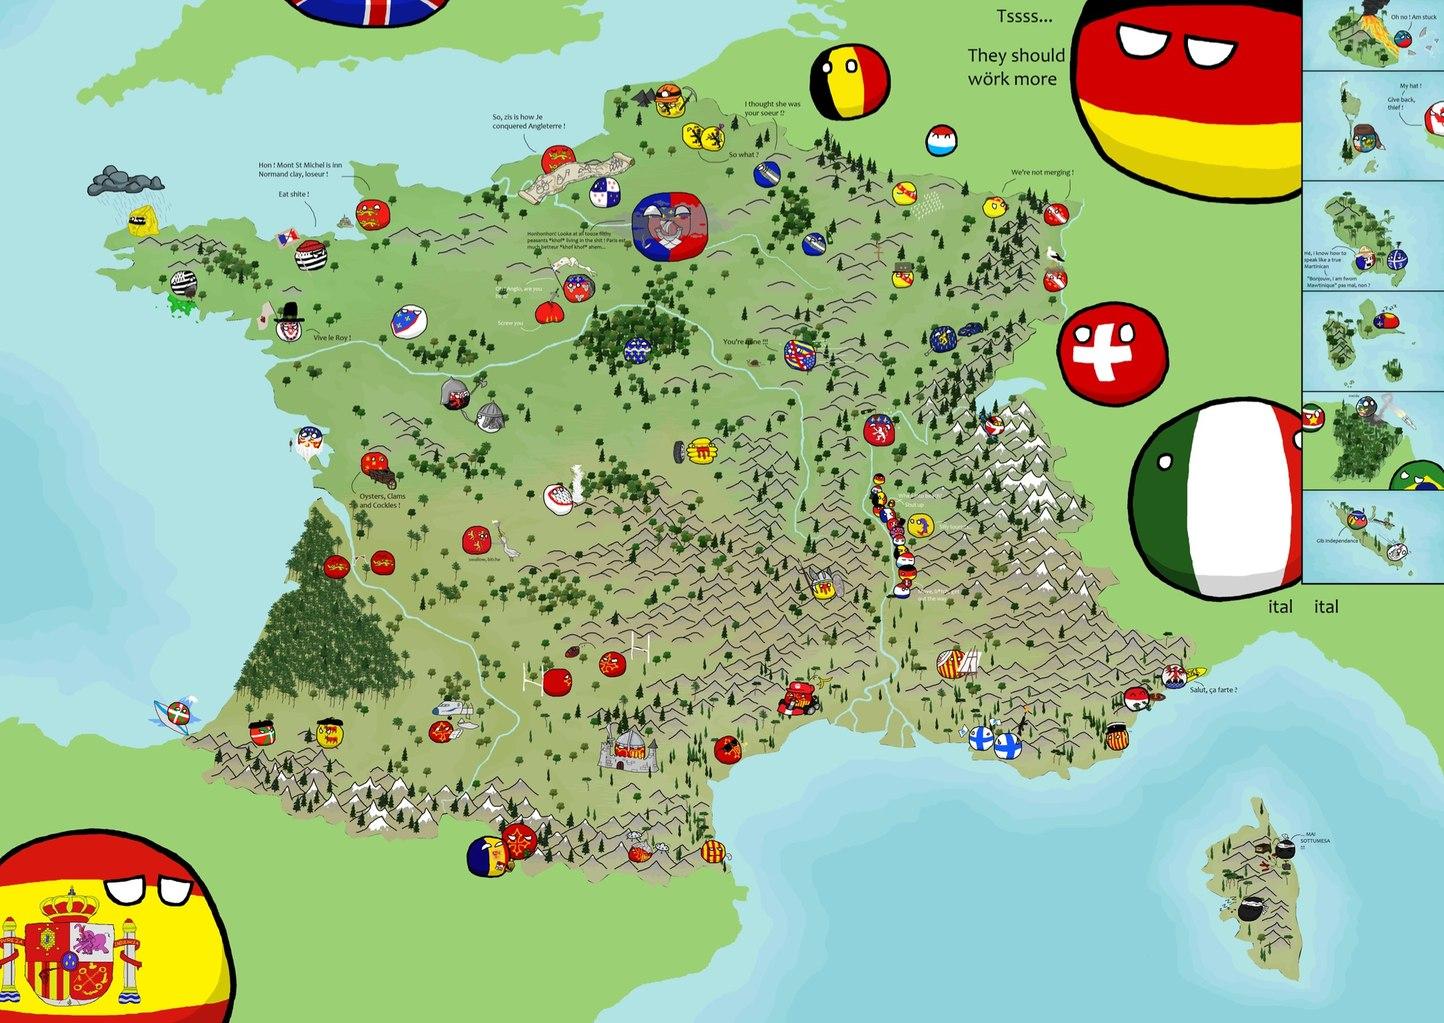 Y'a même un poland ball Rhône-Alpes xD - meme